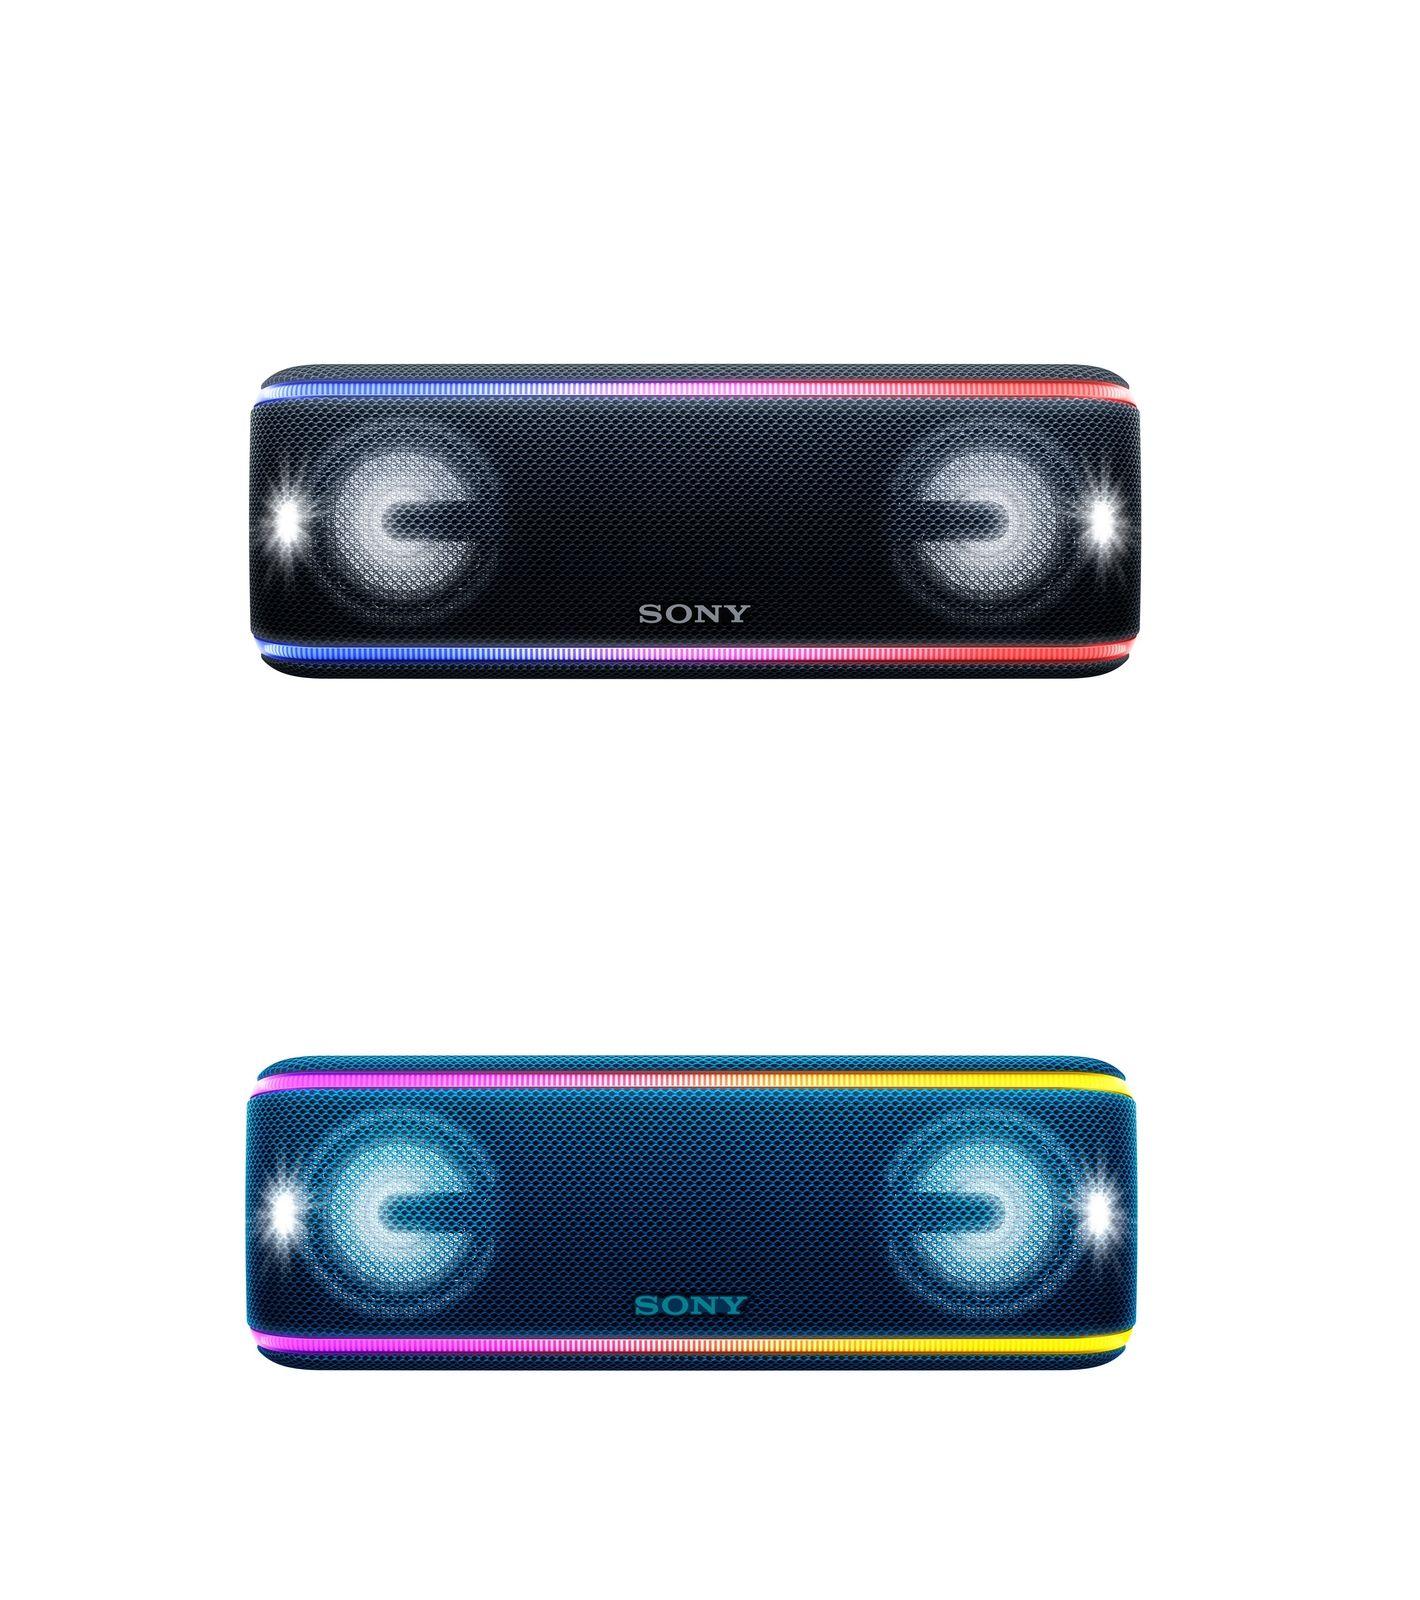 Sony SRS-XB41 Portable Wireless Bluetooth Speaker (REFURB) $89.99